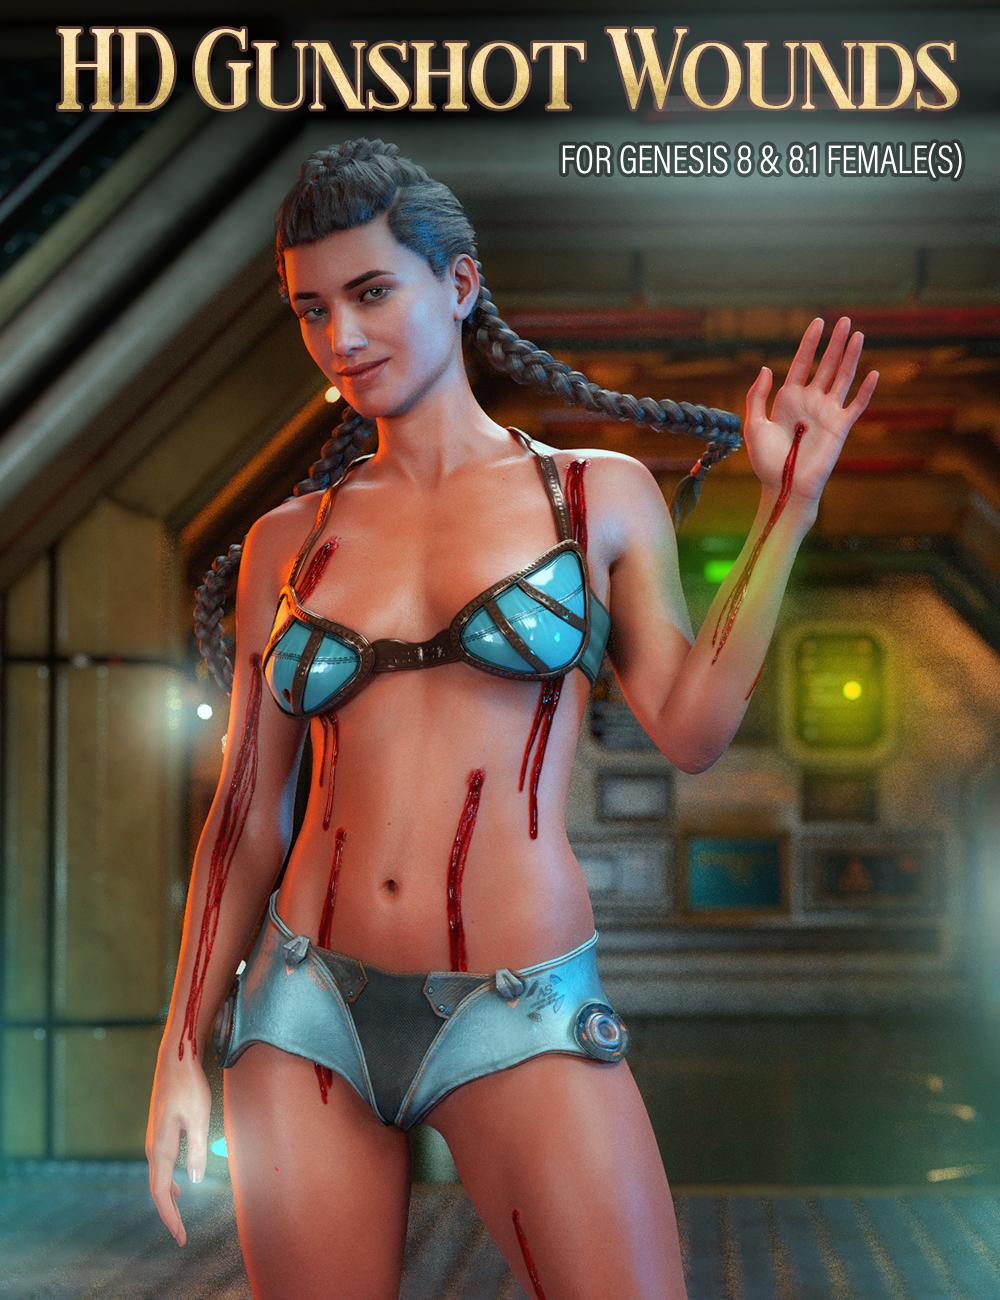 HD Gunshot Wounds for Genesis 8 and 8.1 Females by: FenixPhoenixEsid, 3D Models by Daz 3D